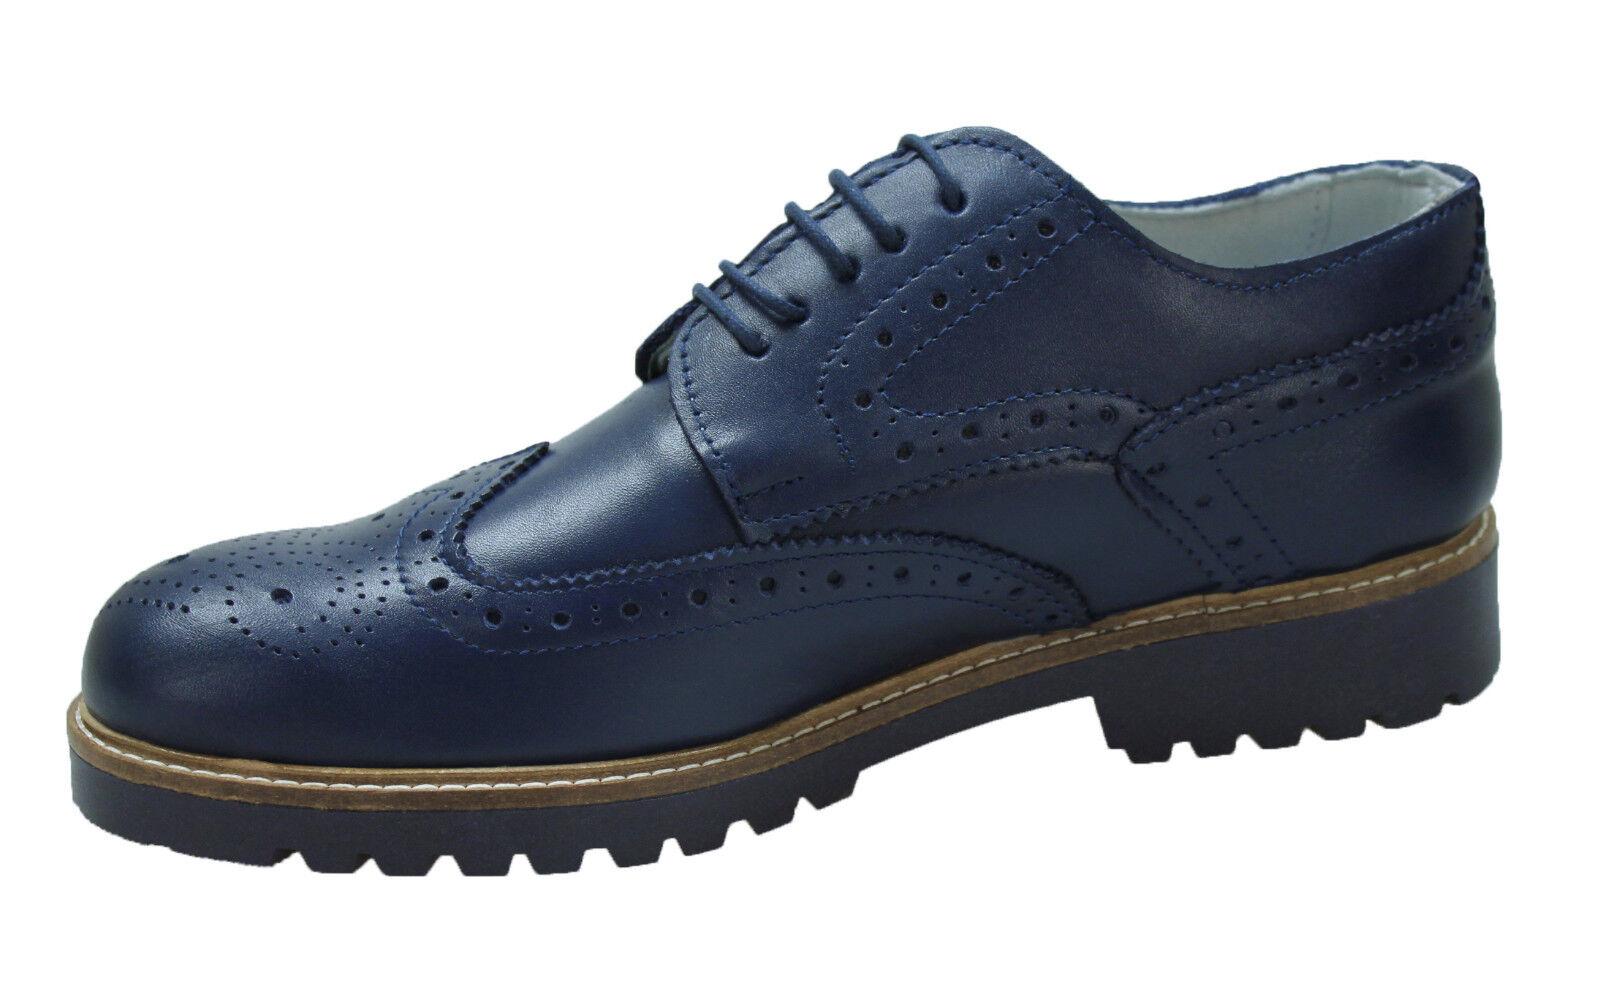 shoes men DIAMOND VÉRITABLE CUIR blue CASUAL ÉLÉGANT 100% MADE IN ITALY